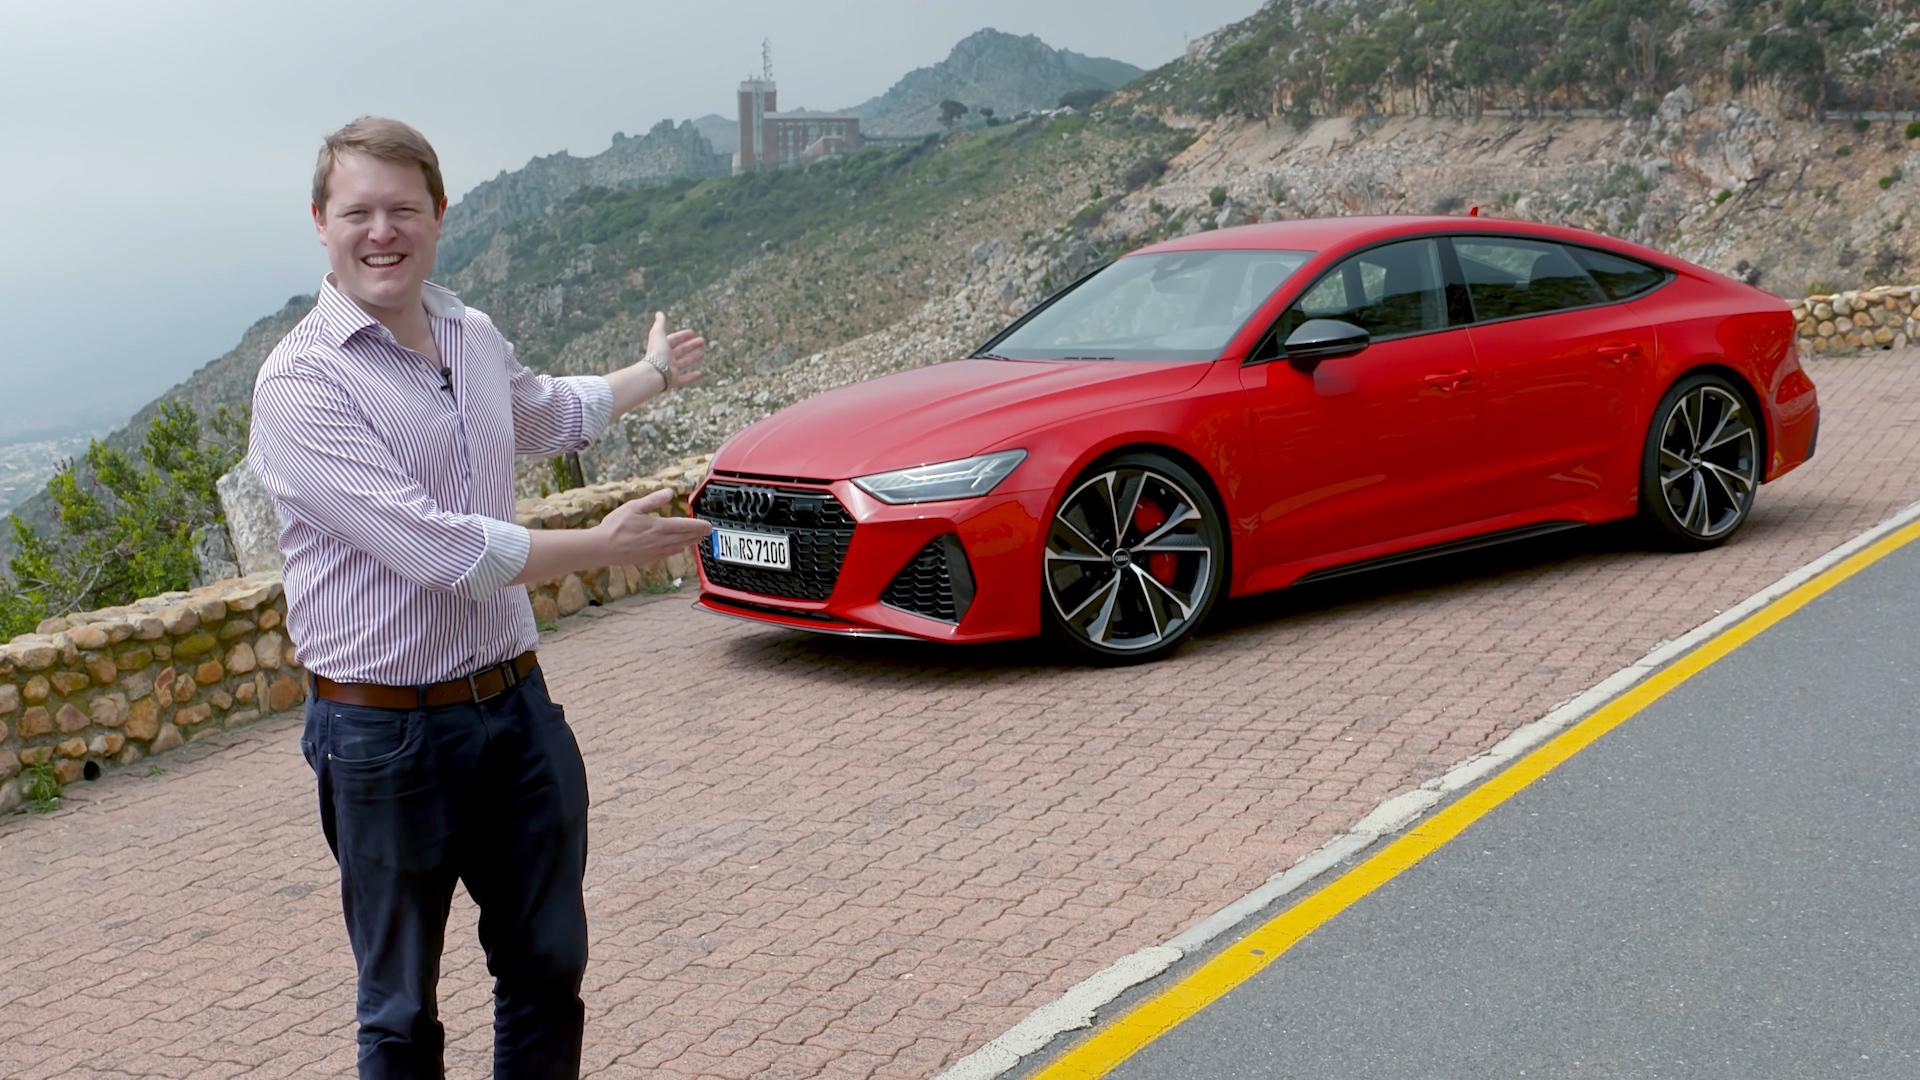 Shmee präsentiert den neuen Audi RS 7 Sportback